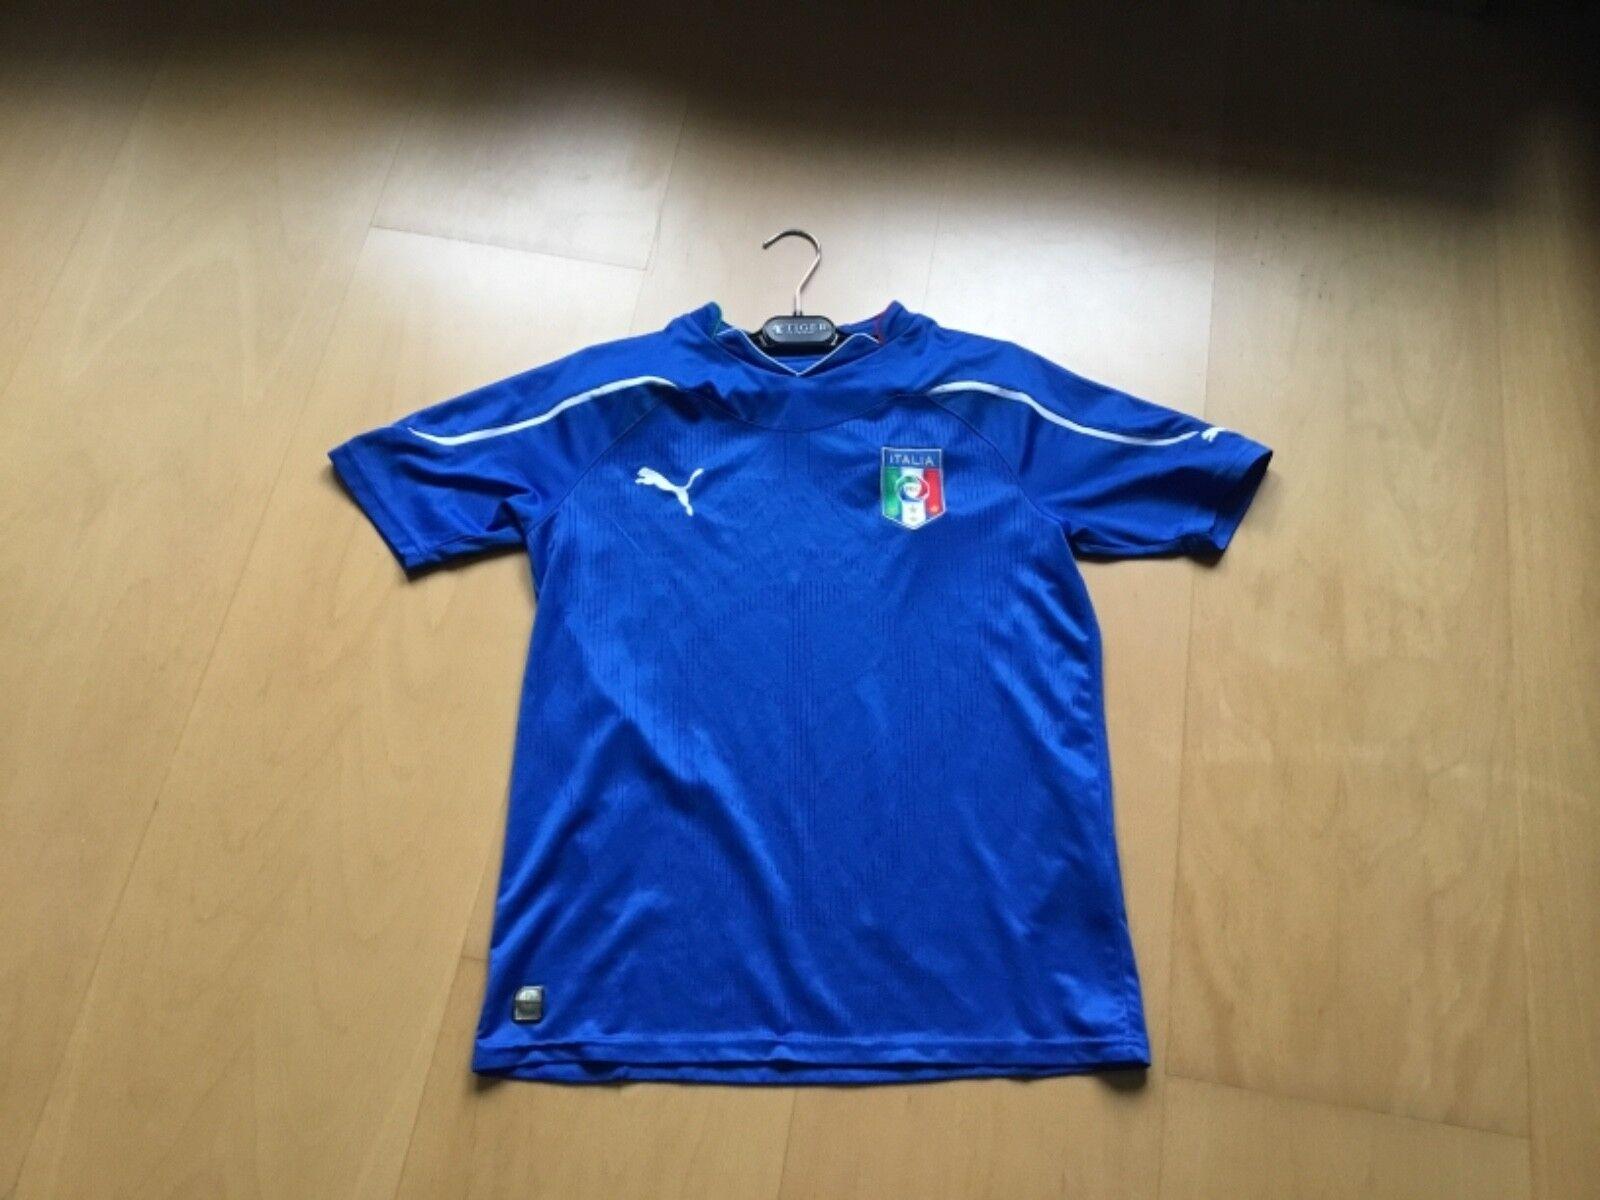 100%ORIG PUMA FUßBALL ITALIA ITALIA ITALIA NAZIONALE TRIKOT MAGLIA AZZURRA YXL UK 32 34 164 14 4906c6